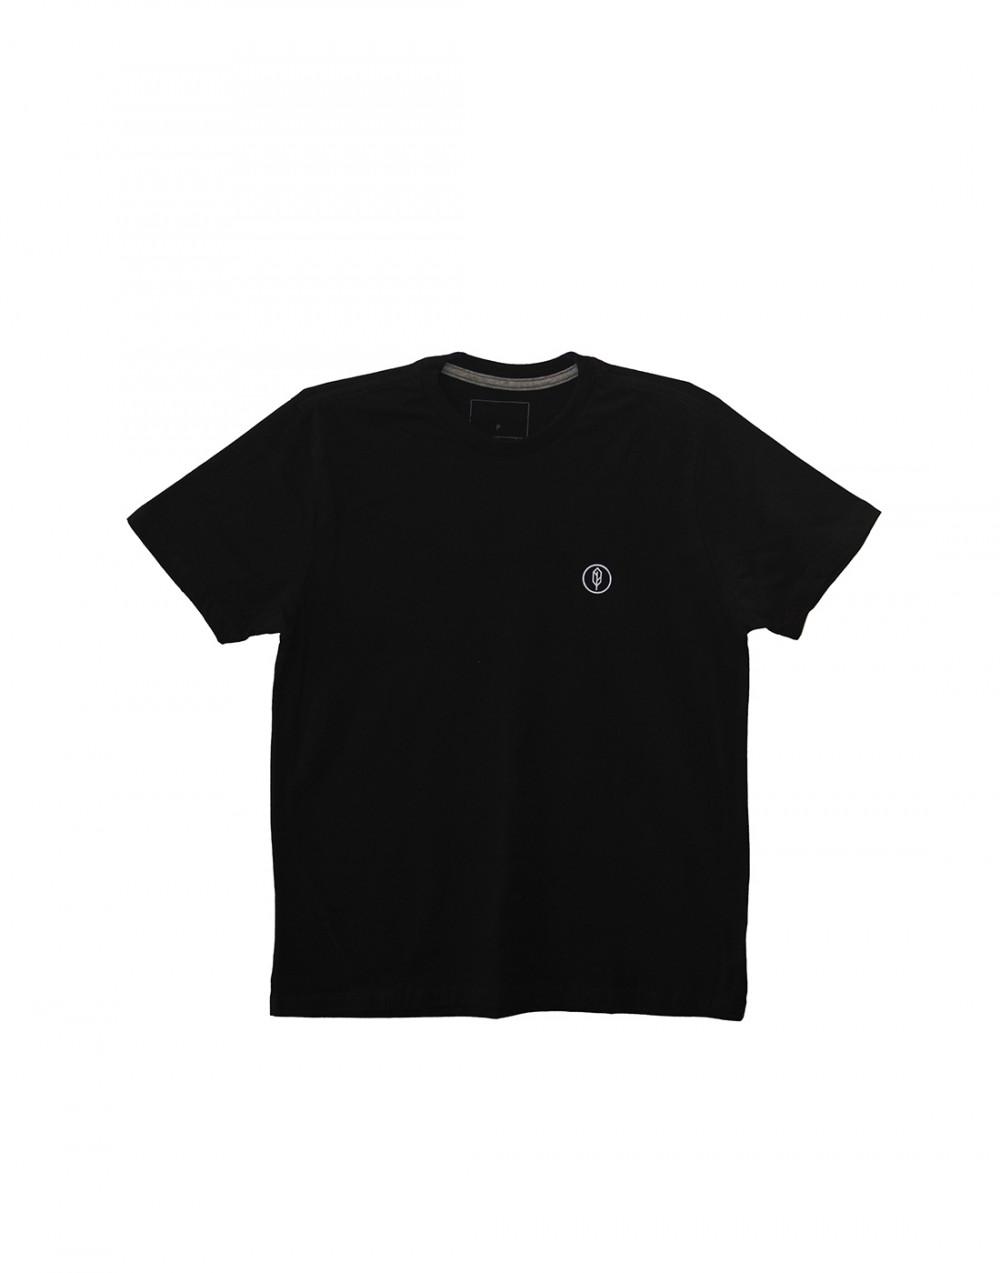 Camiseta Estampada Free Preto Pena